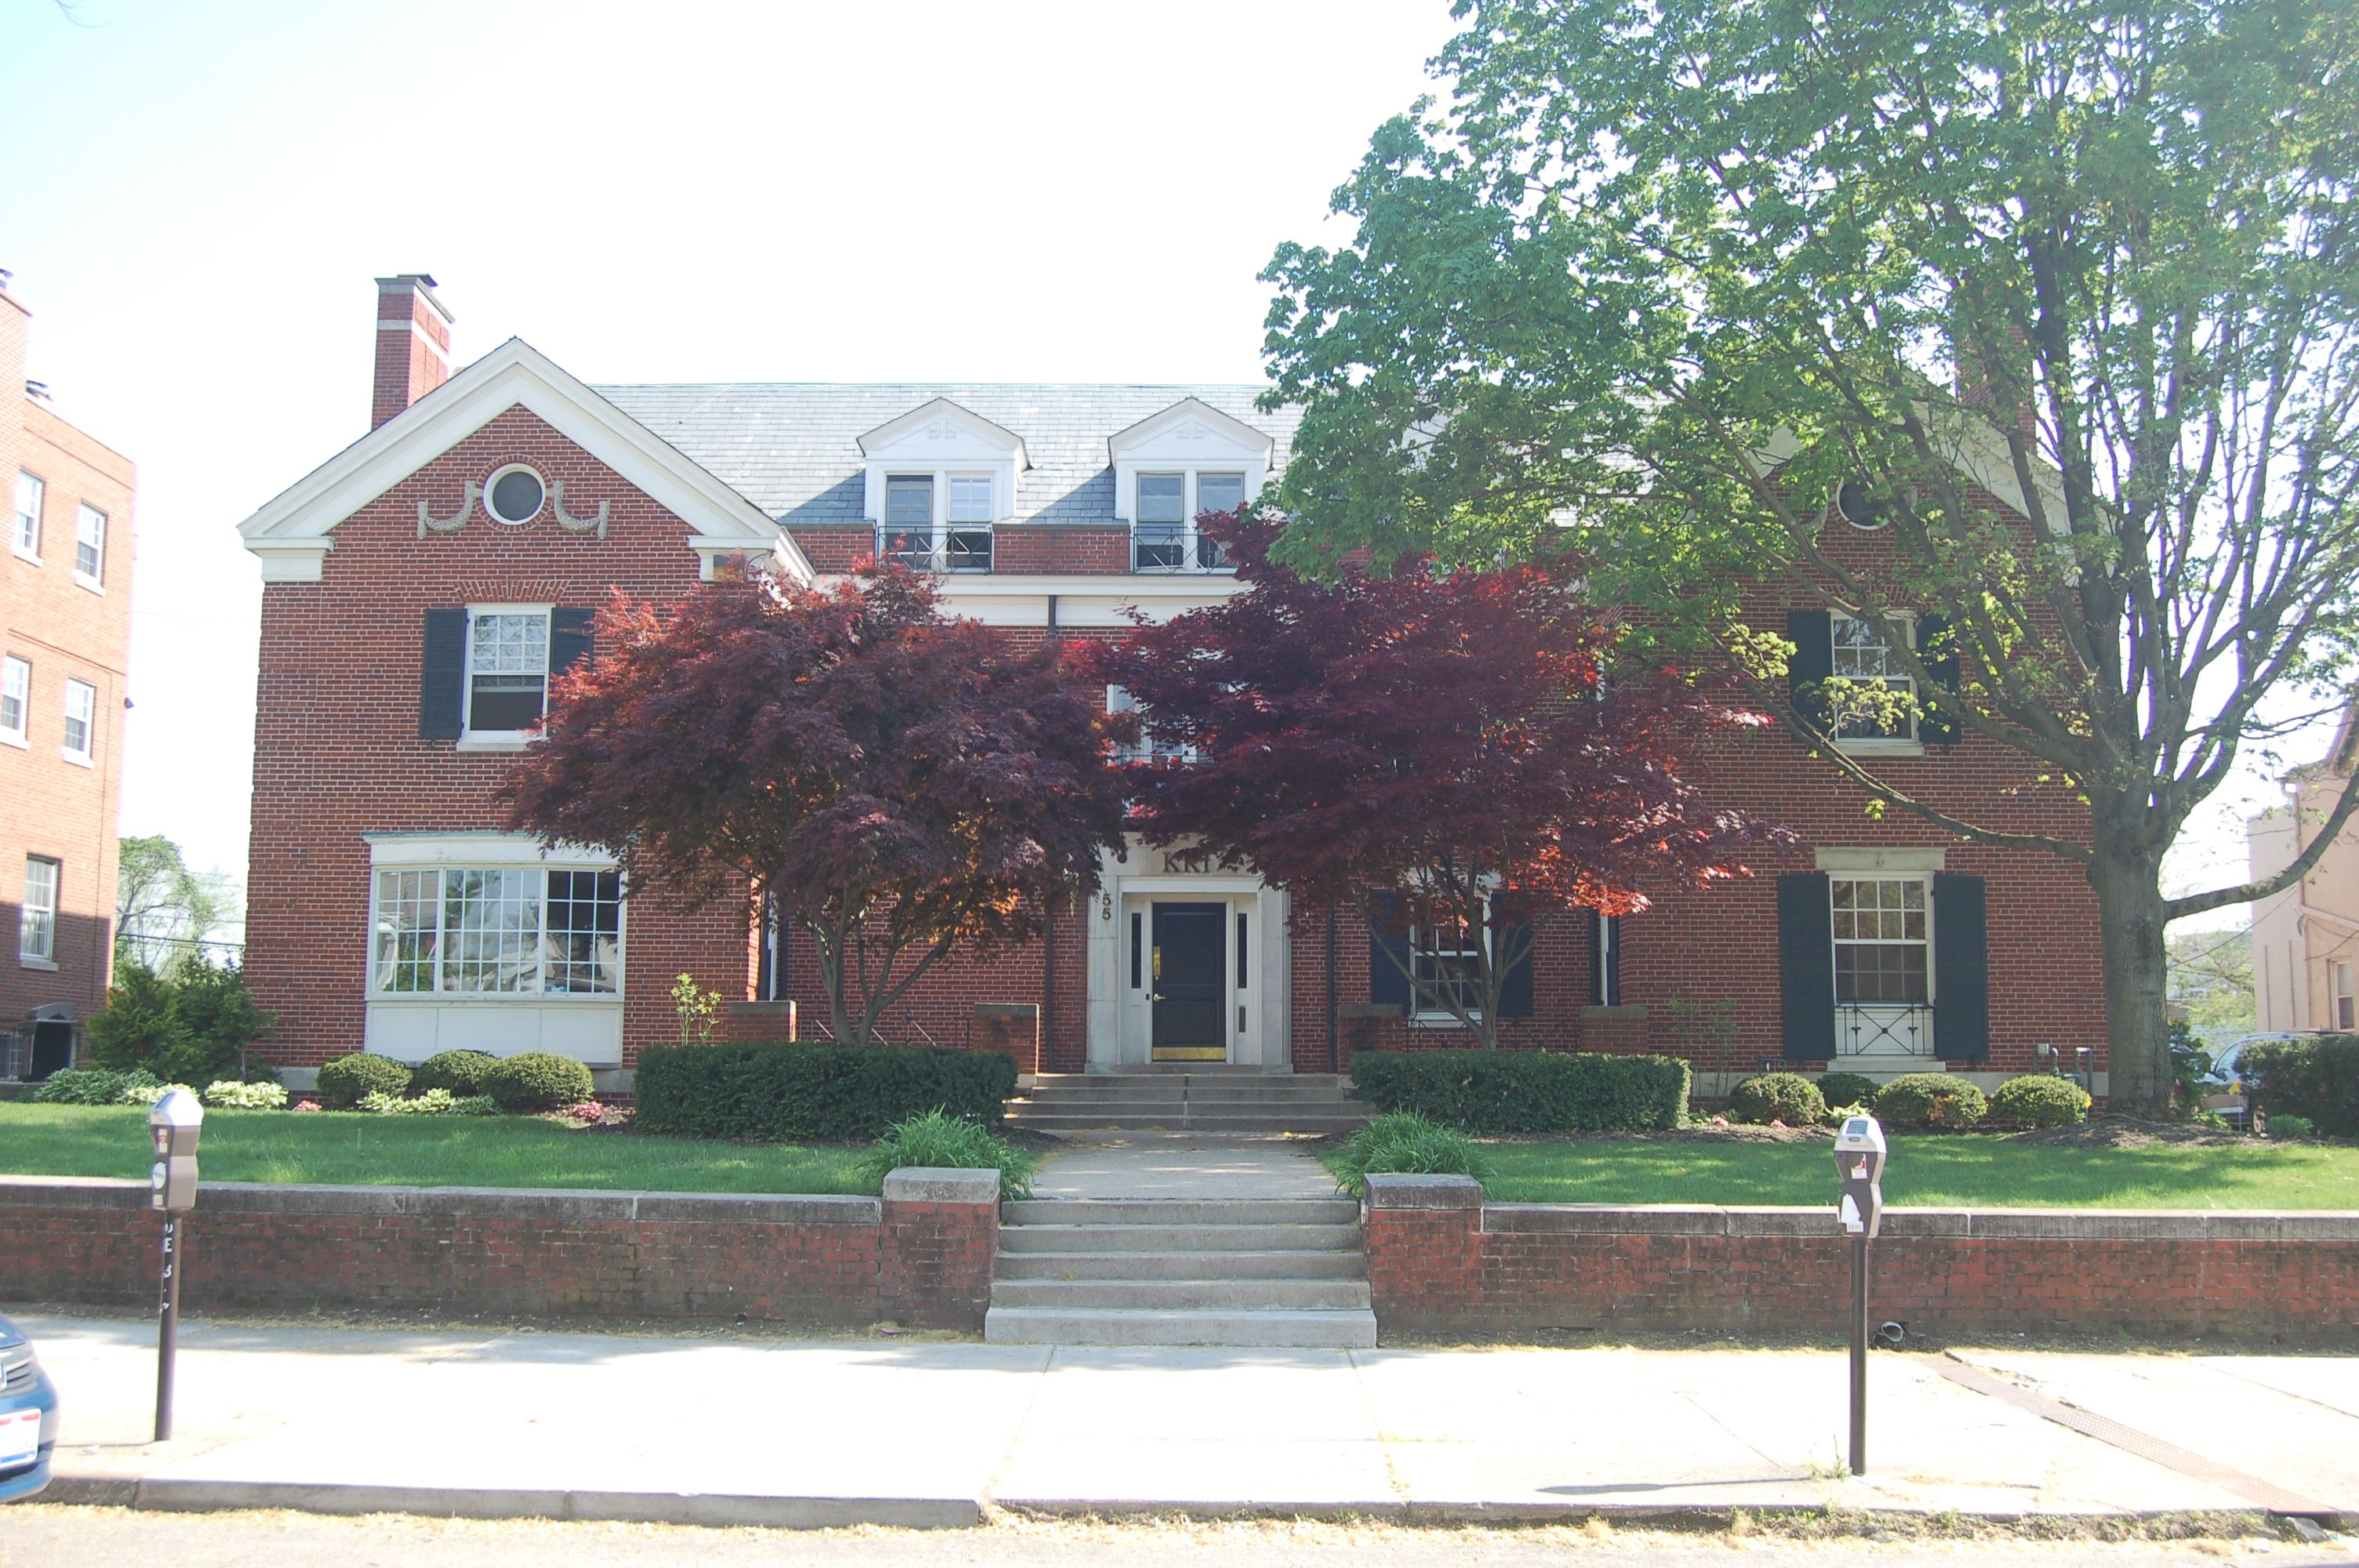 The Ohio State University Ohio State University Campus The Ohio State University Ohio State University